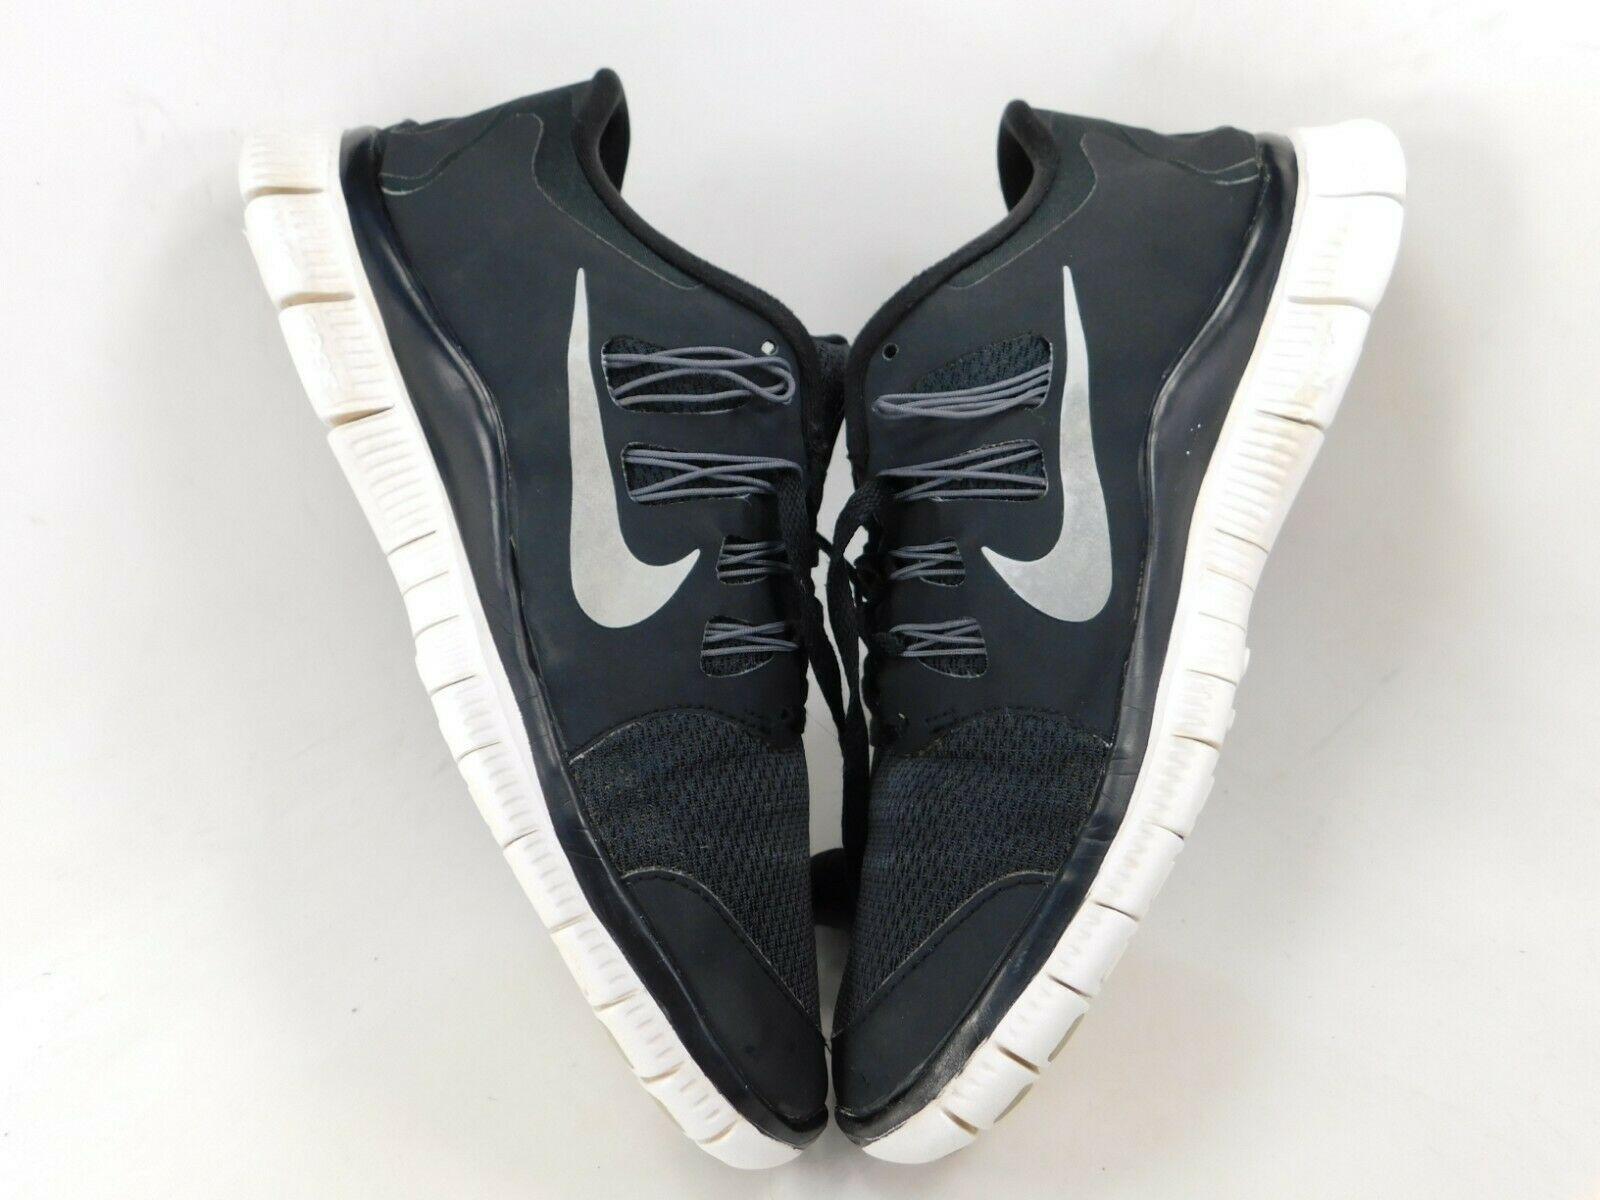 Nike Free 5.0+ Size US 9.5 M (D) EU 41 Women's Running Shoes Black 580591-002 image 6